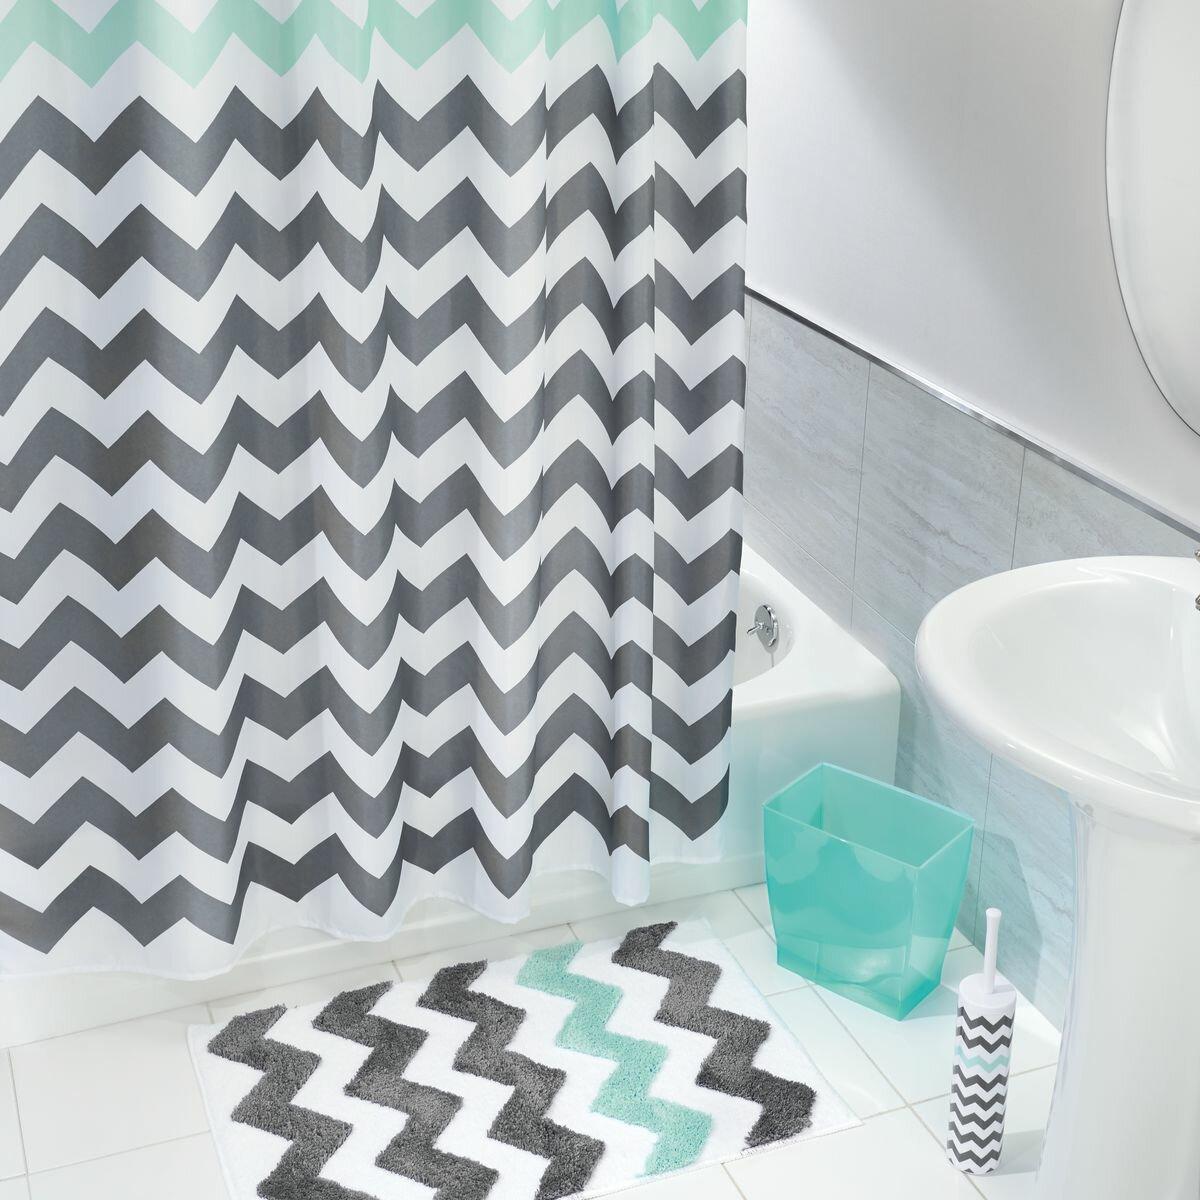 Interdesign Microfiber Bathroom Shower Accent Rug: InterDesign Chevron Microfiber Shower Bath Rug & Reviews